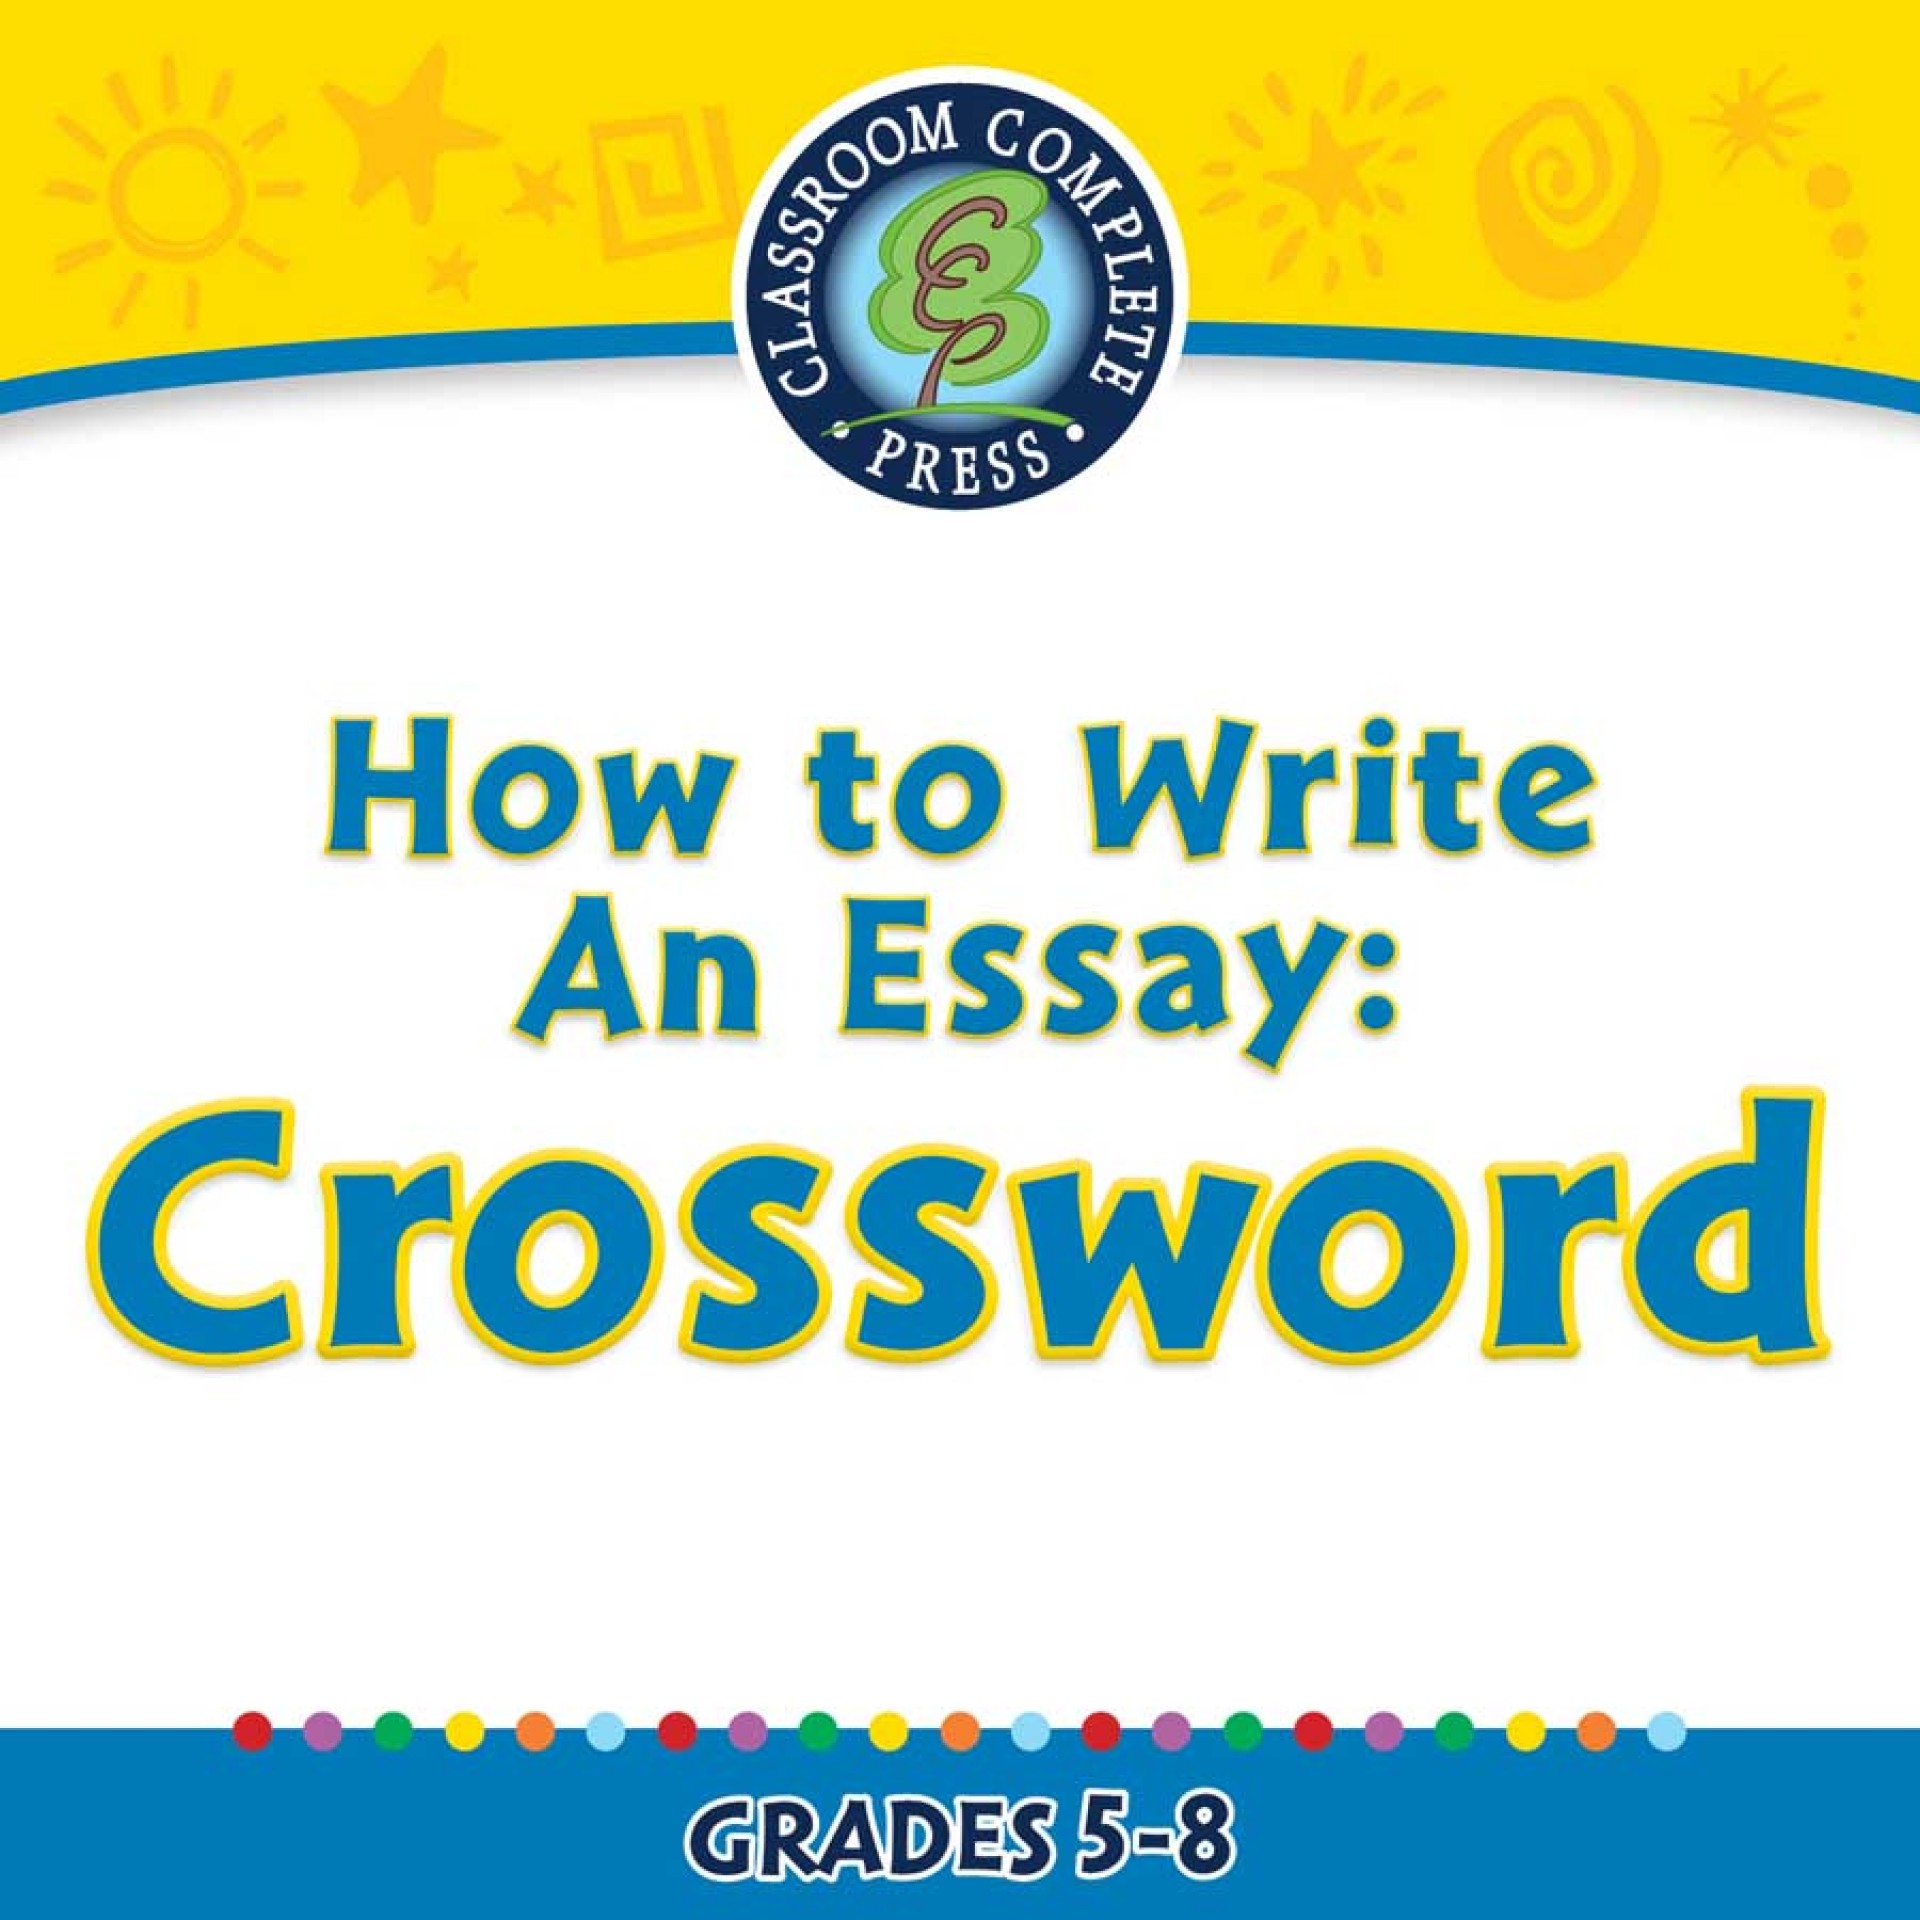 003 Essay Example Cc7106cw Cover Fascinating Crossword Byline Clue Short Puzzle Persuasive 1920